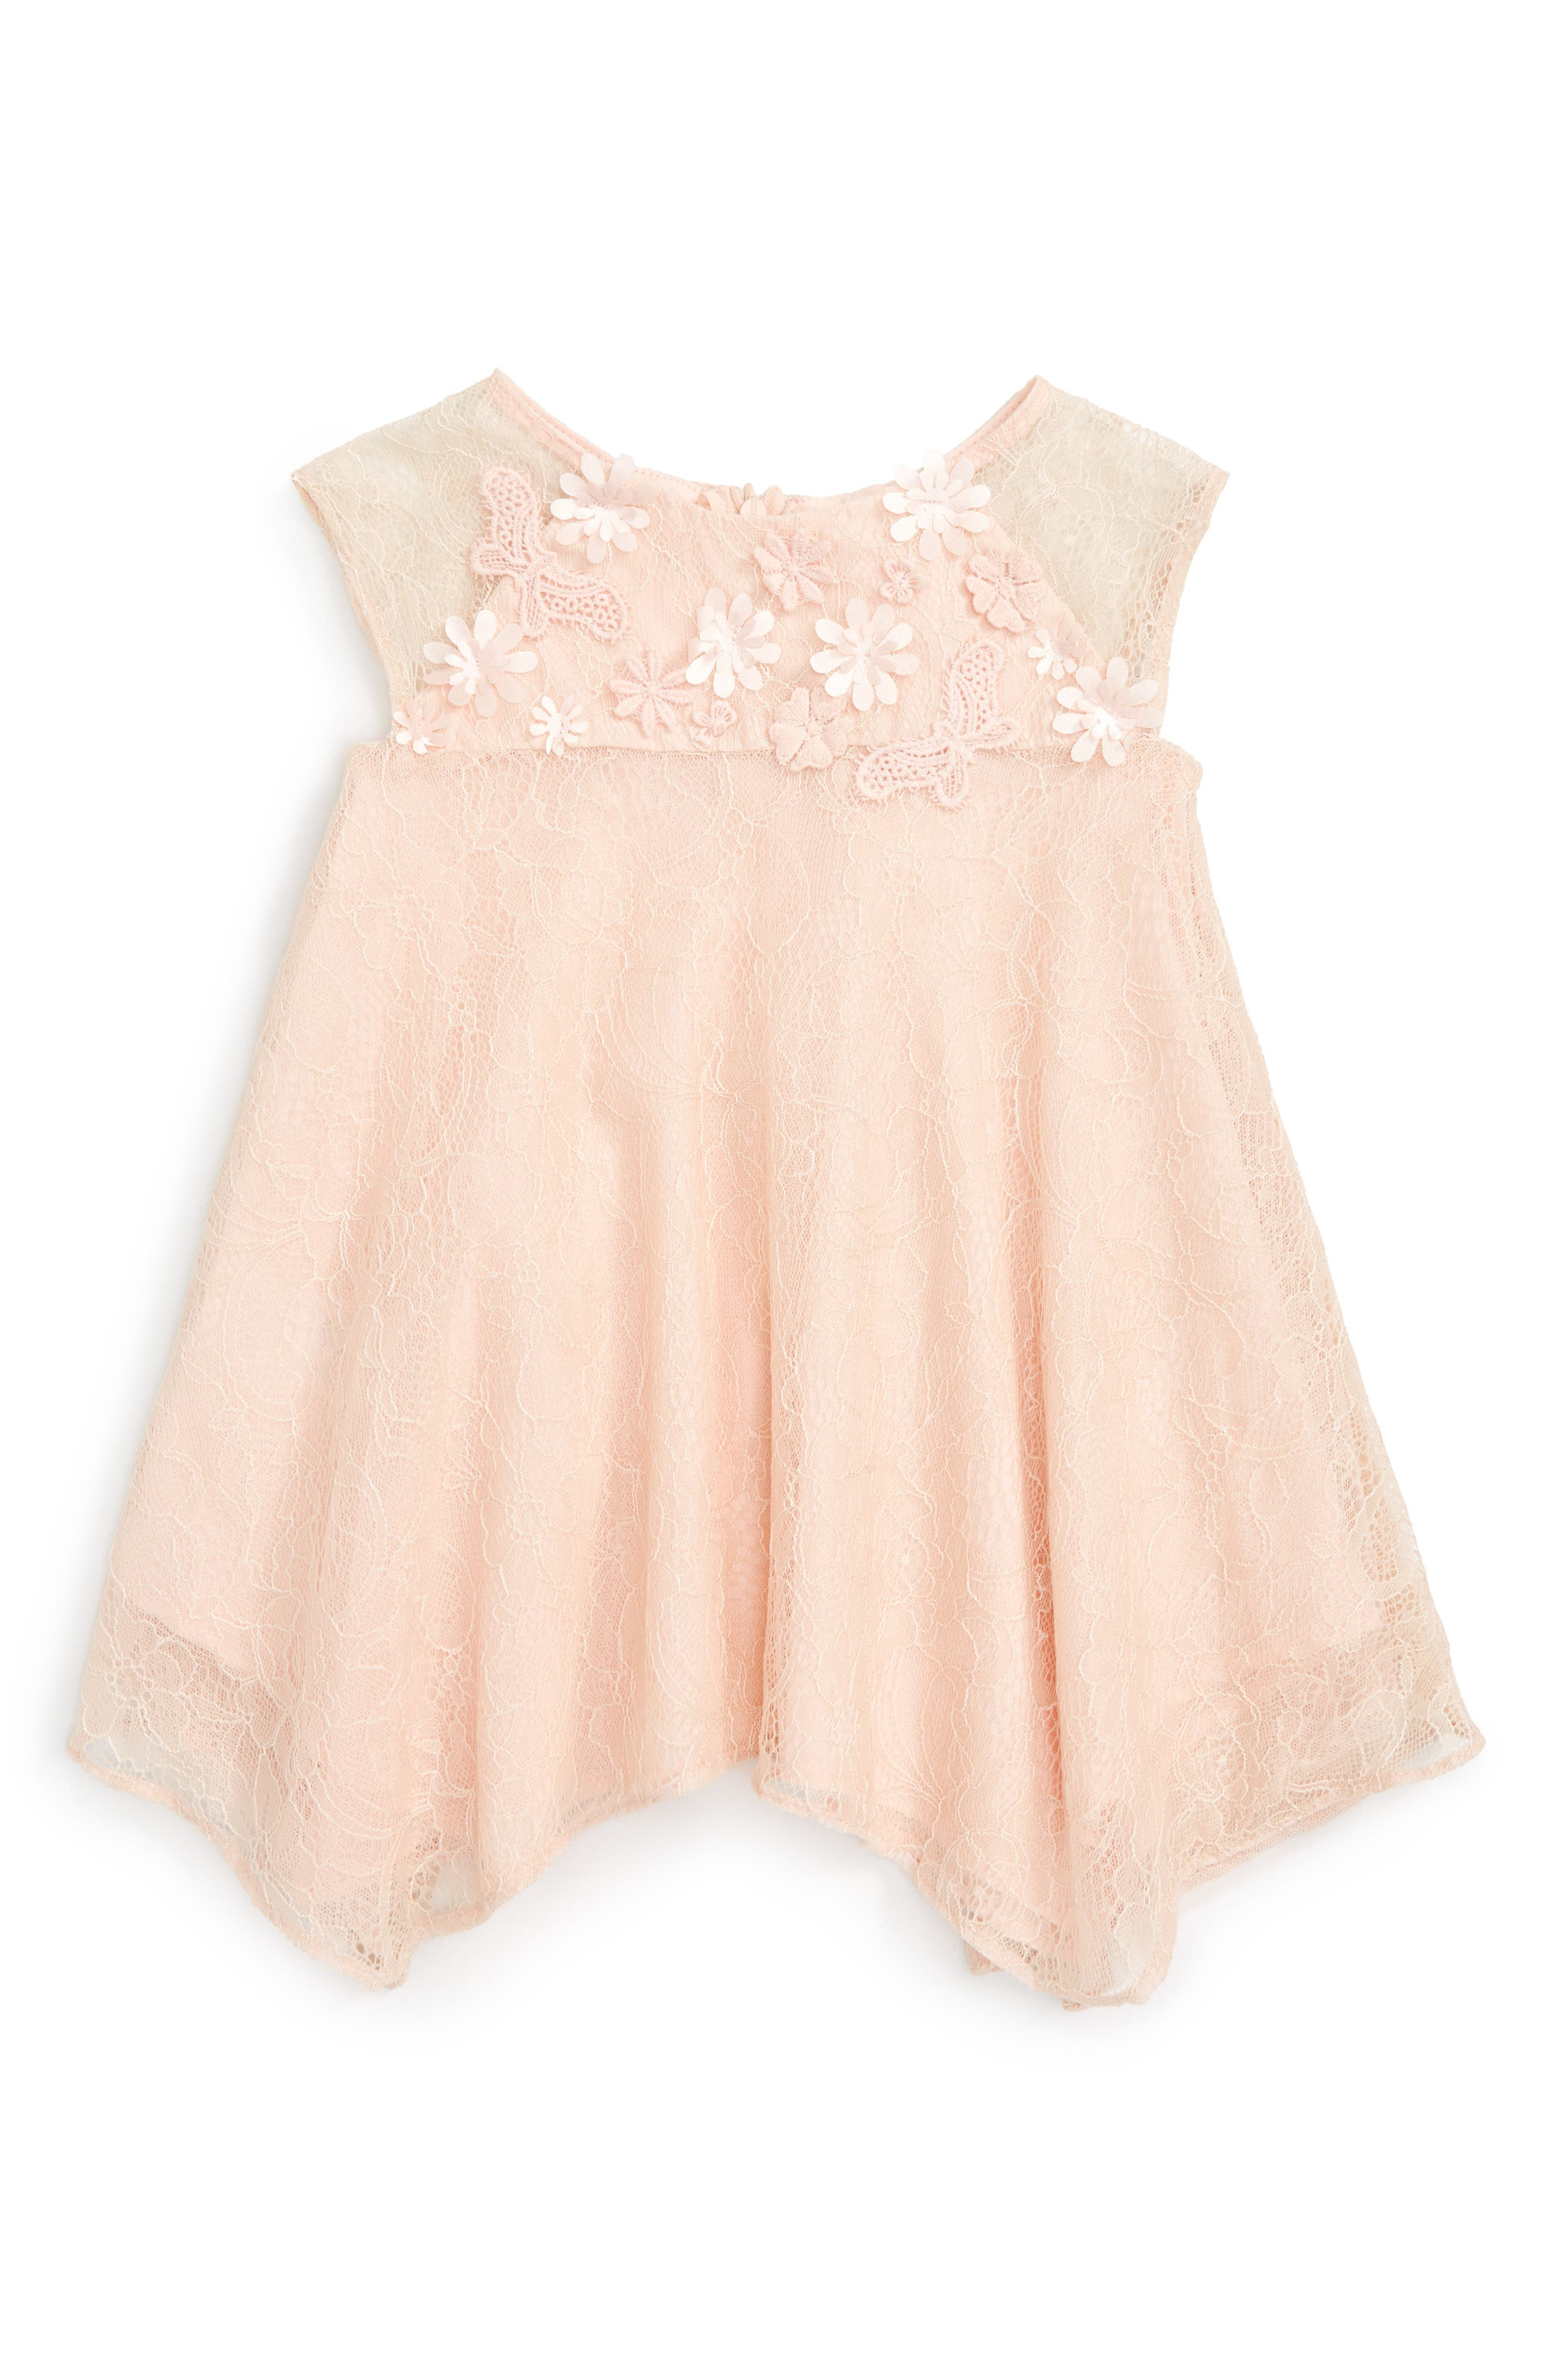 Popatu Floral Embellished Swing Dress (Baby Girls)